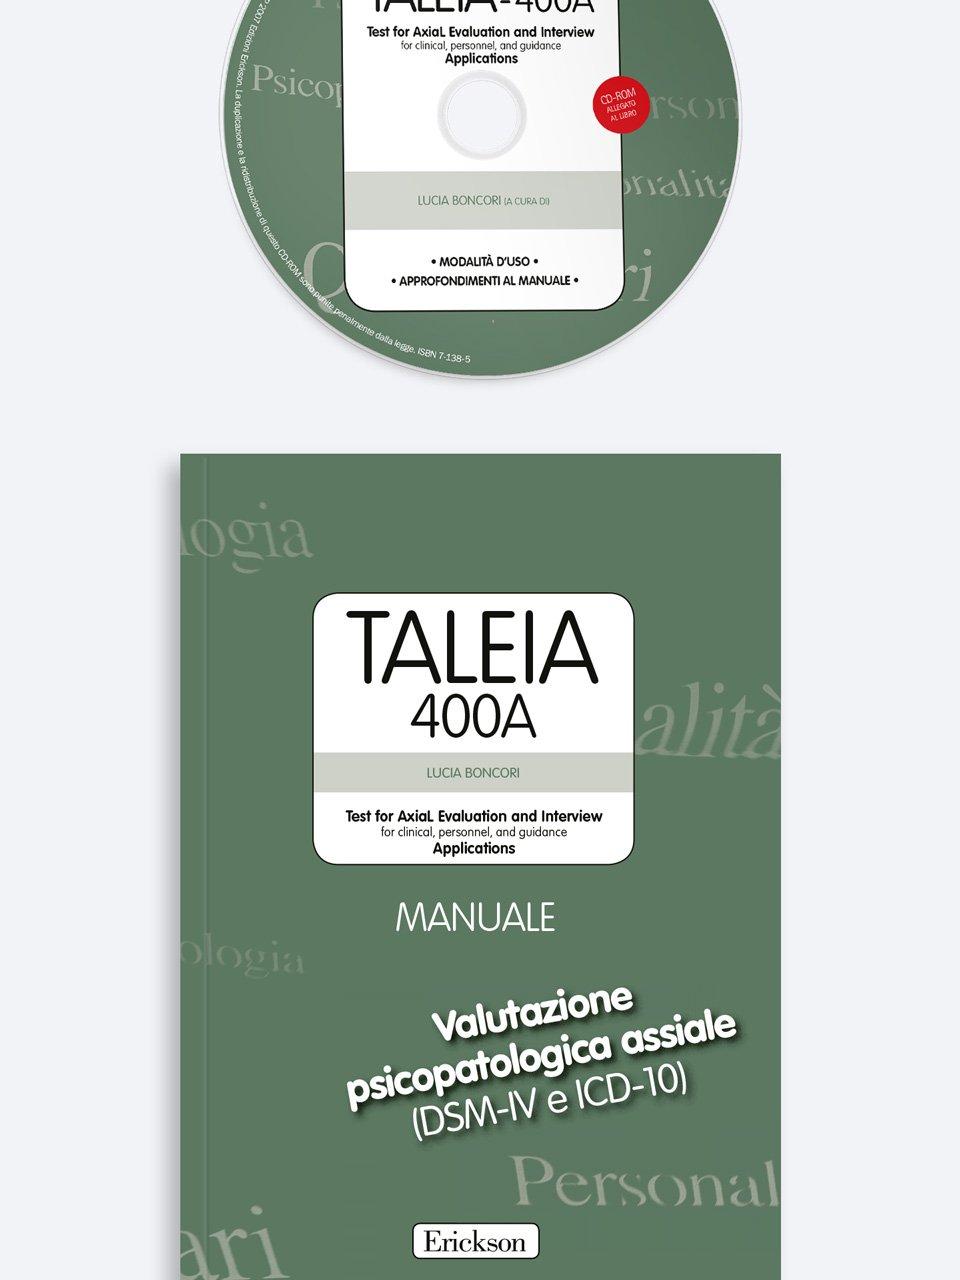 TALEIA-400A - Test for Axial Evaluation and Interview Applications - App e software per Scuola, Autismo, Dislessia e DSA - Erickson